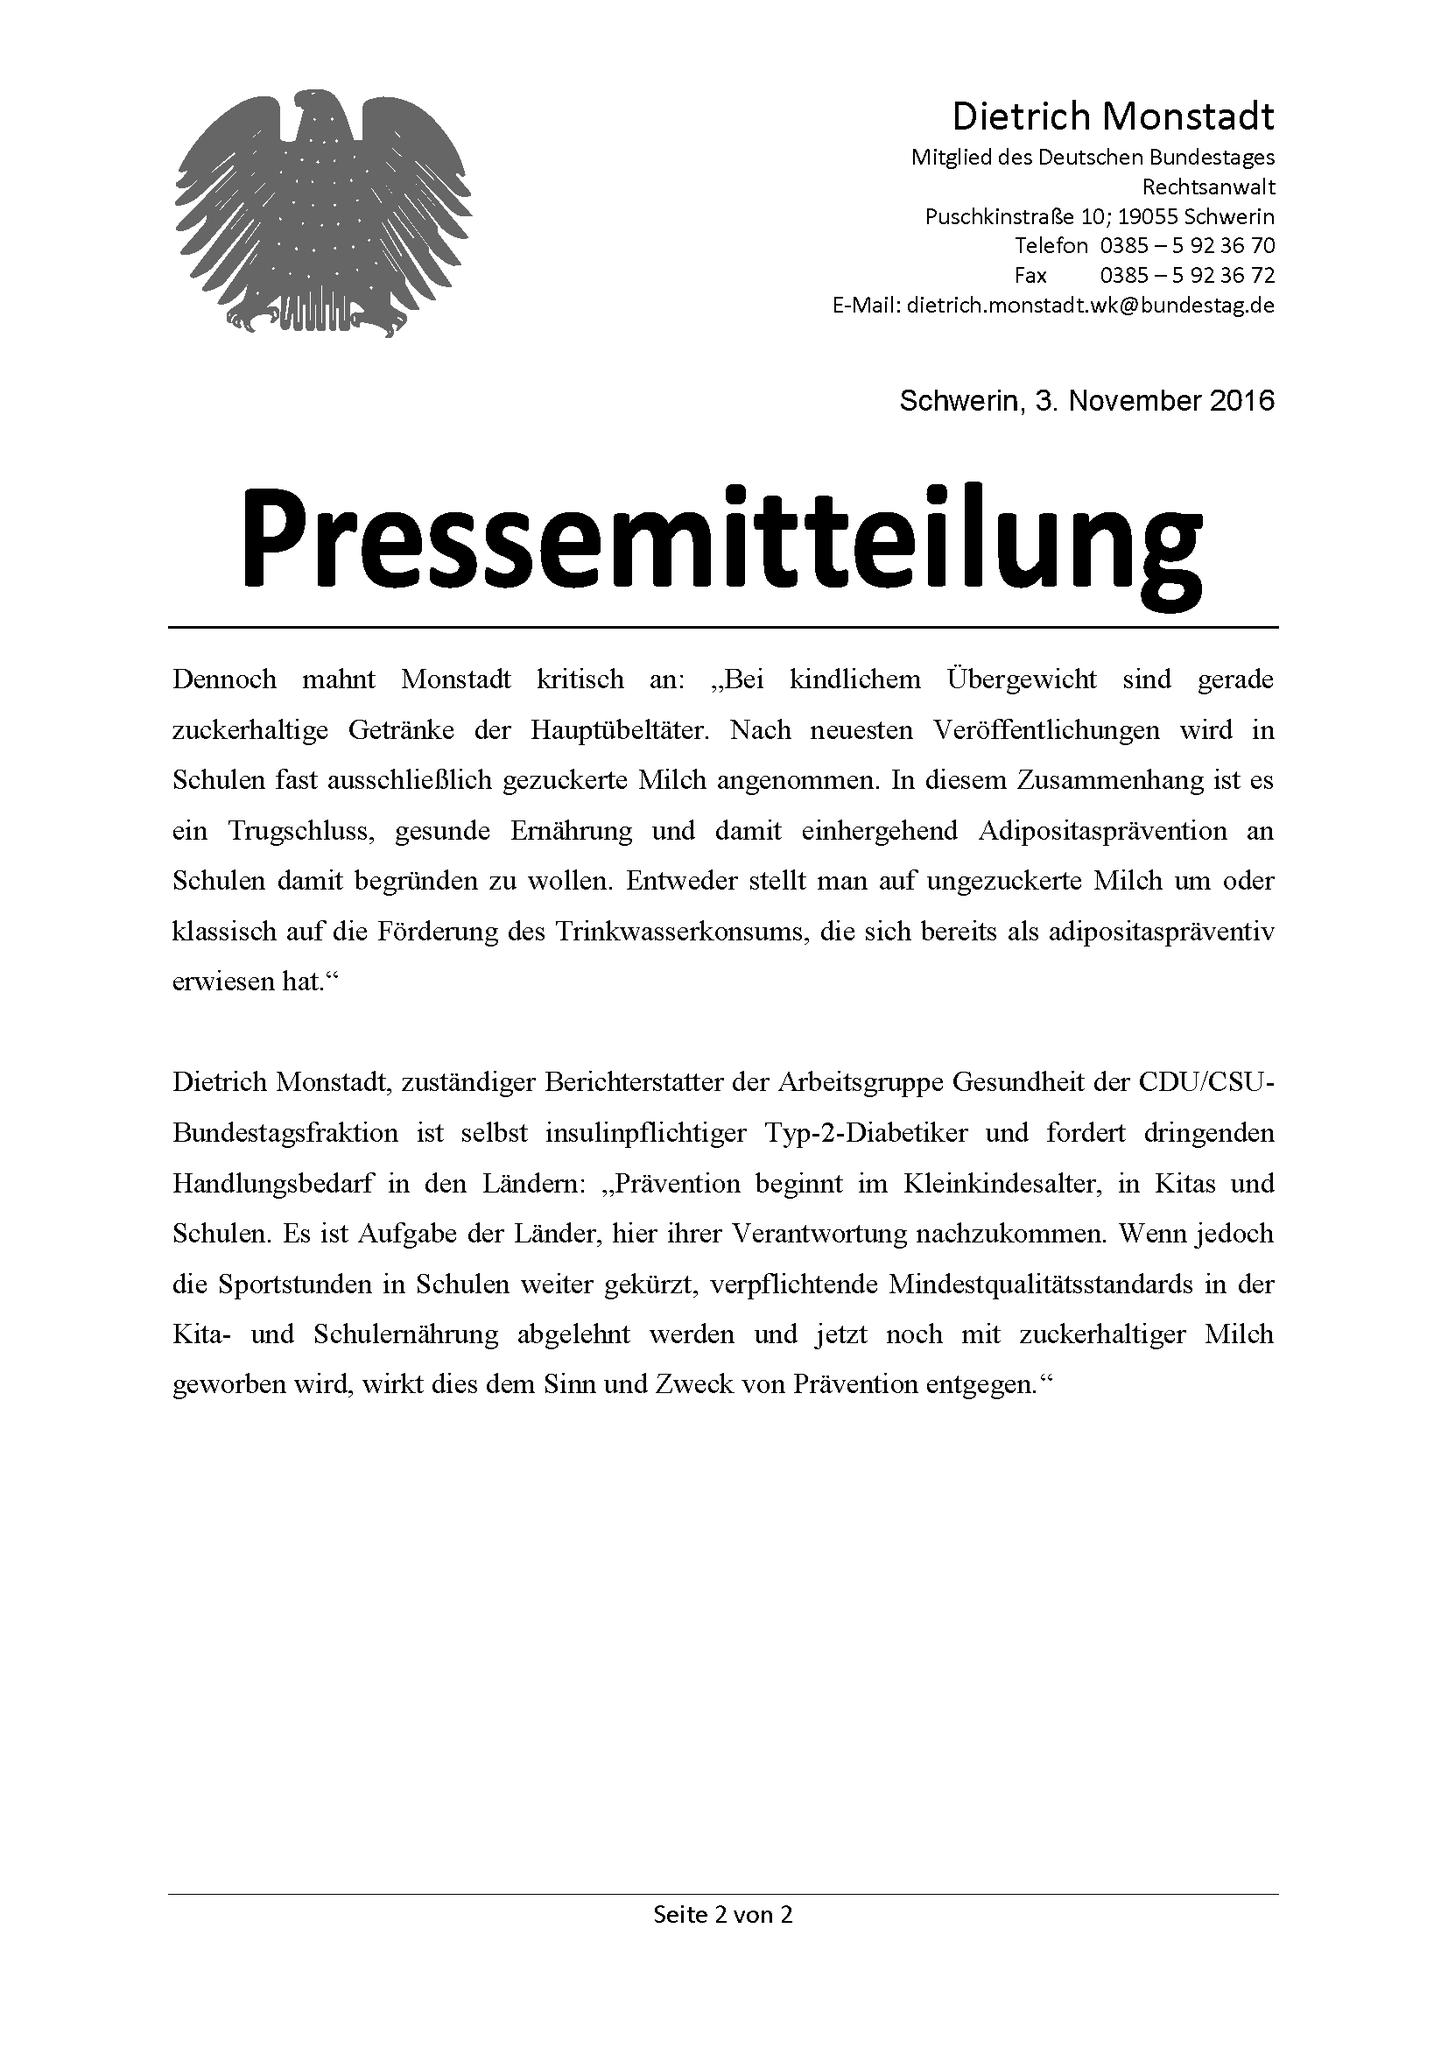 Archiv - Dietrich Monstadt MdB